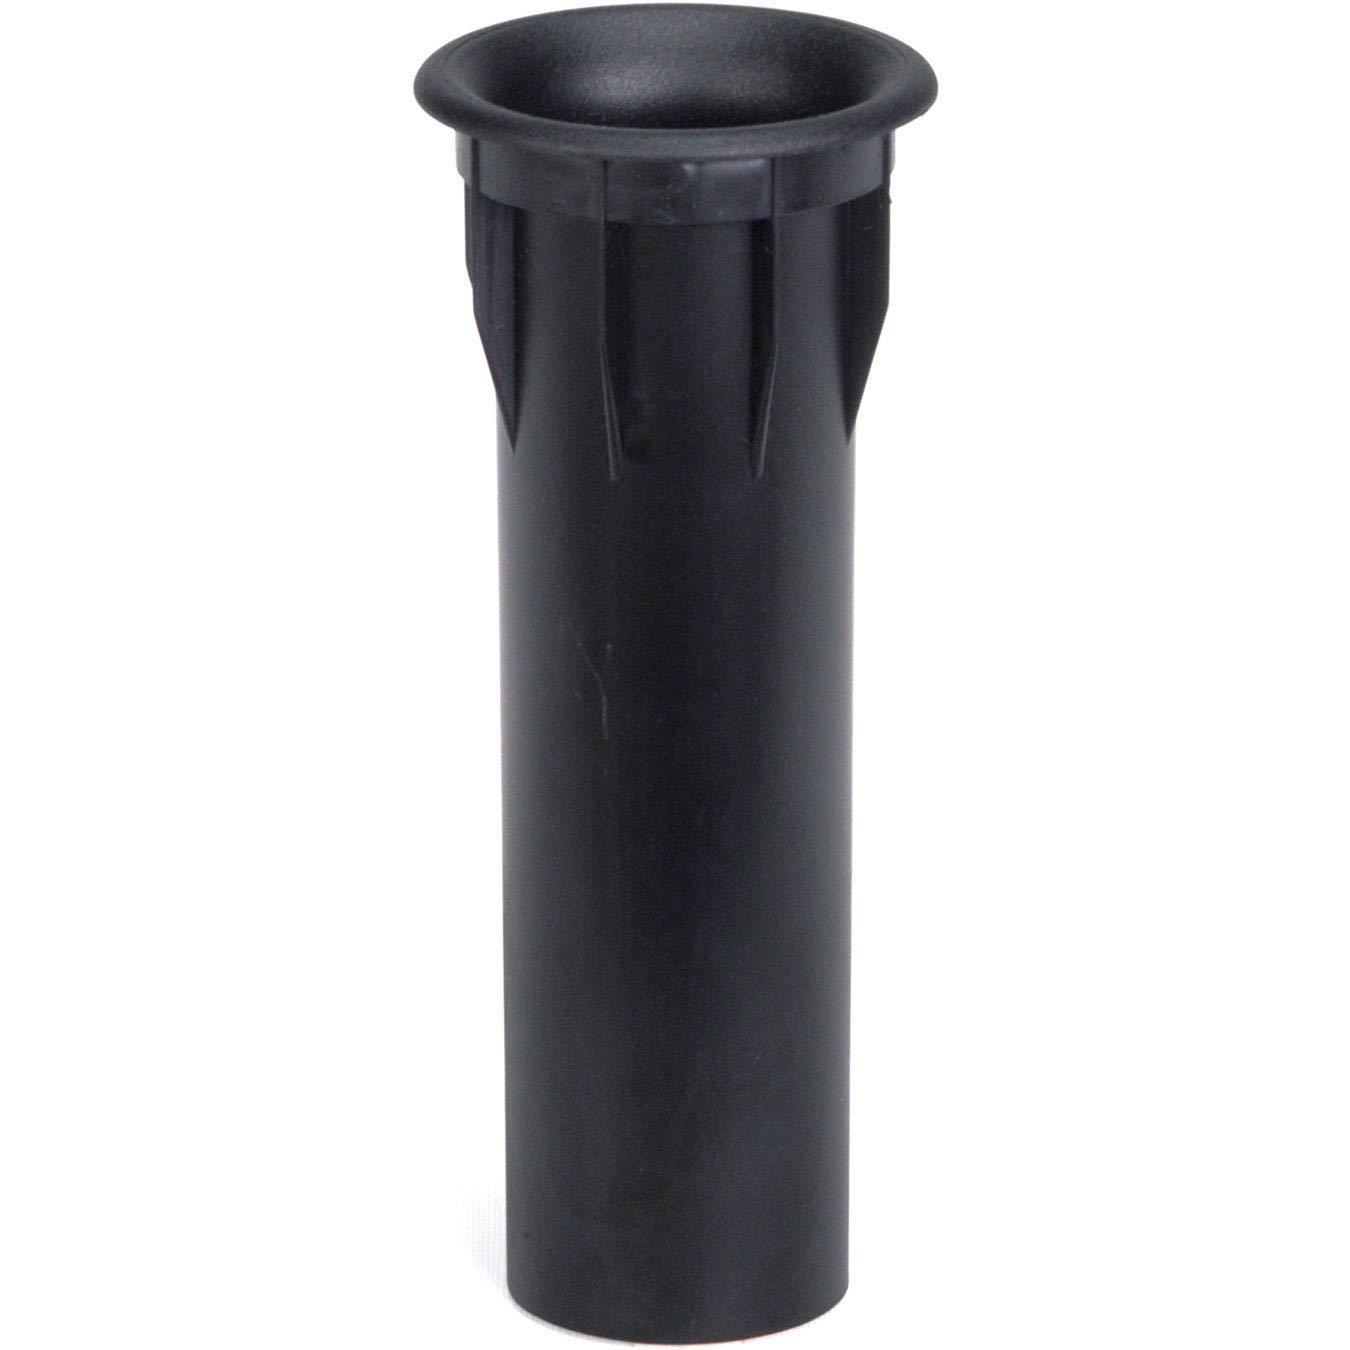 SECO77-1 KIT Aluminum 1100 SECO7 37 degree flared tube gaskets